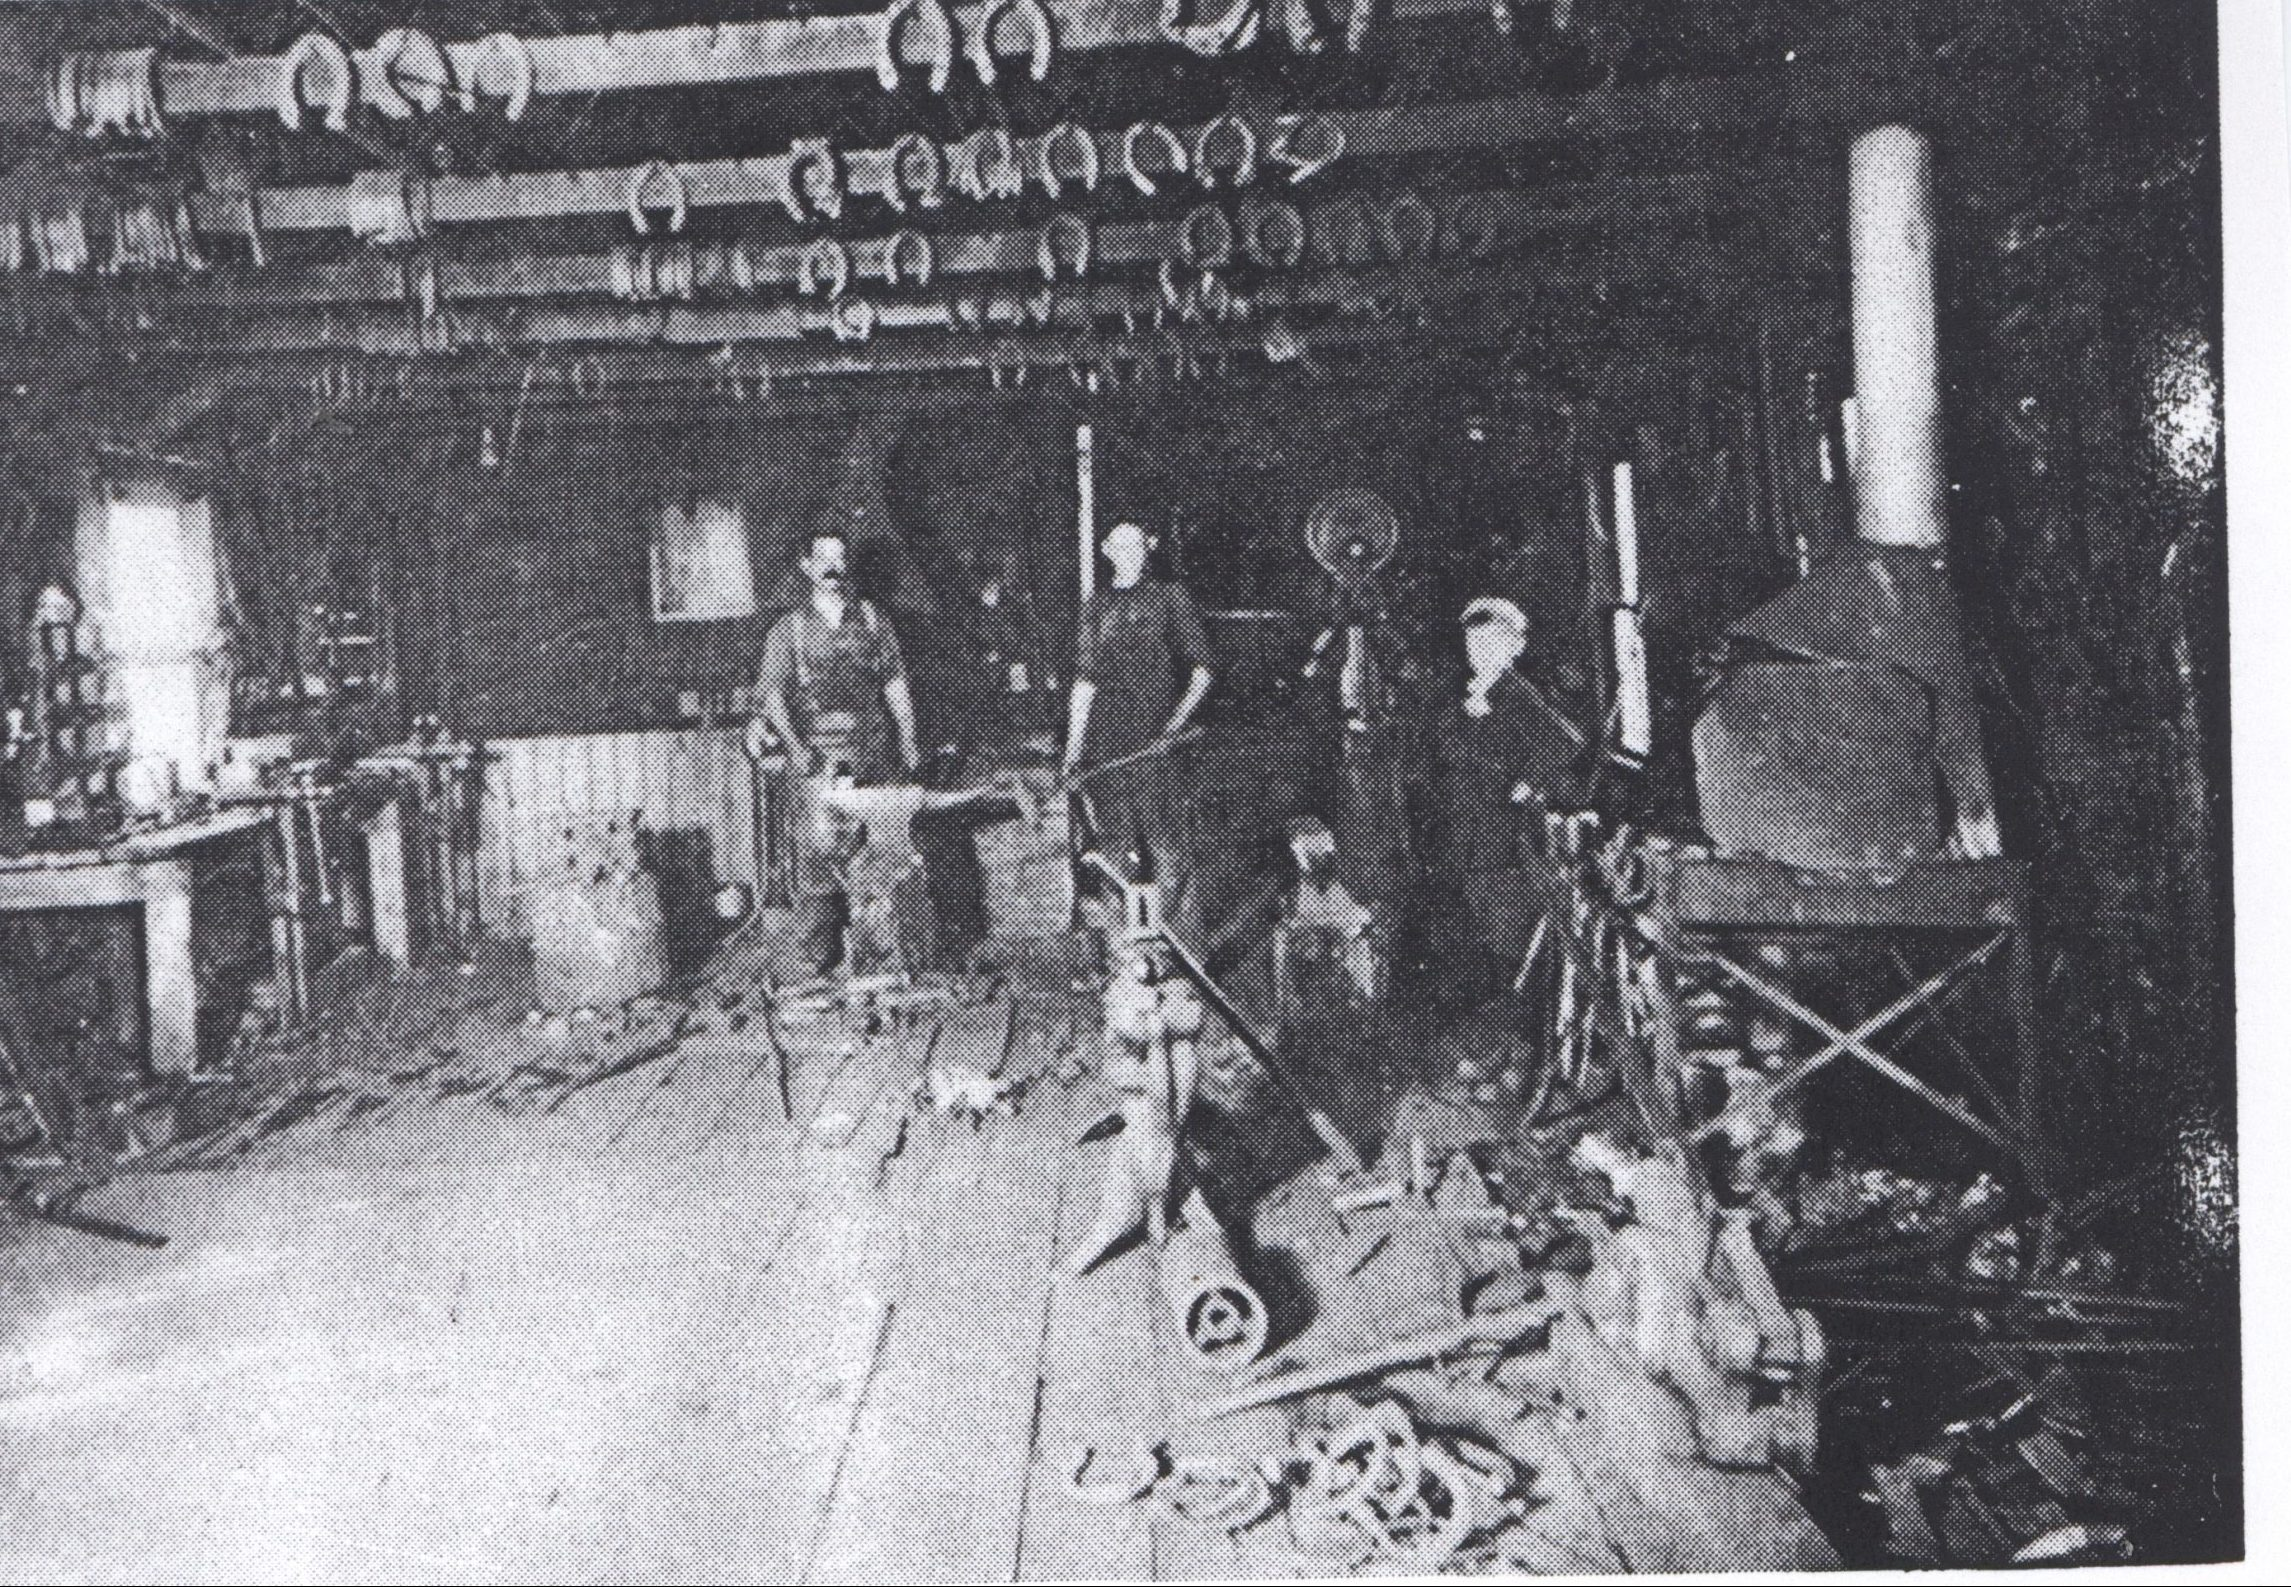 Lacombe Blacksmith Shop